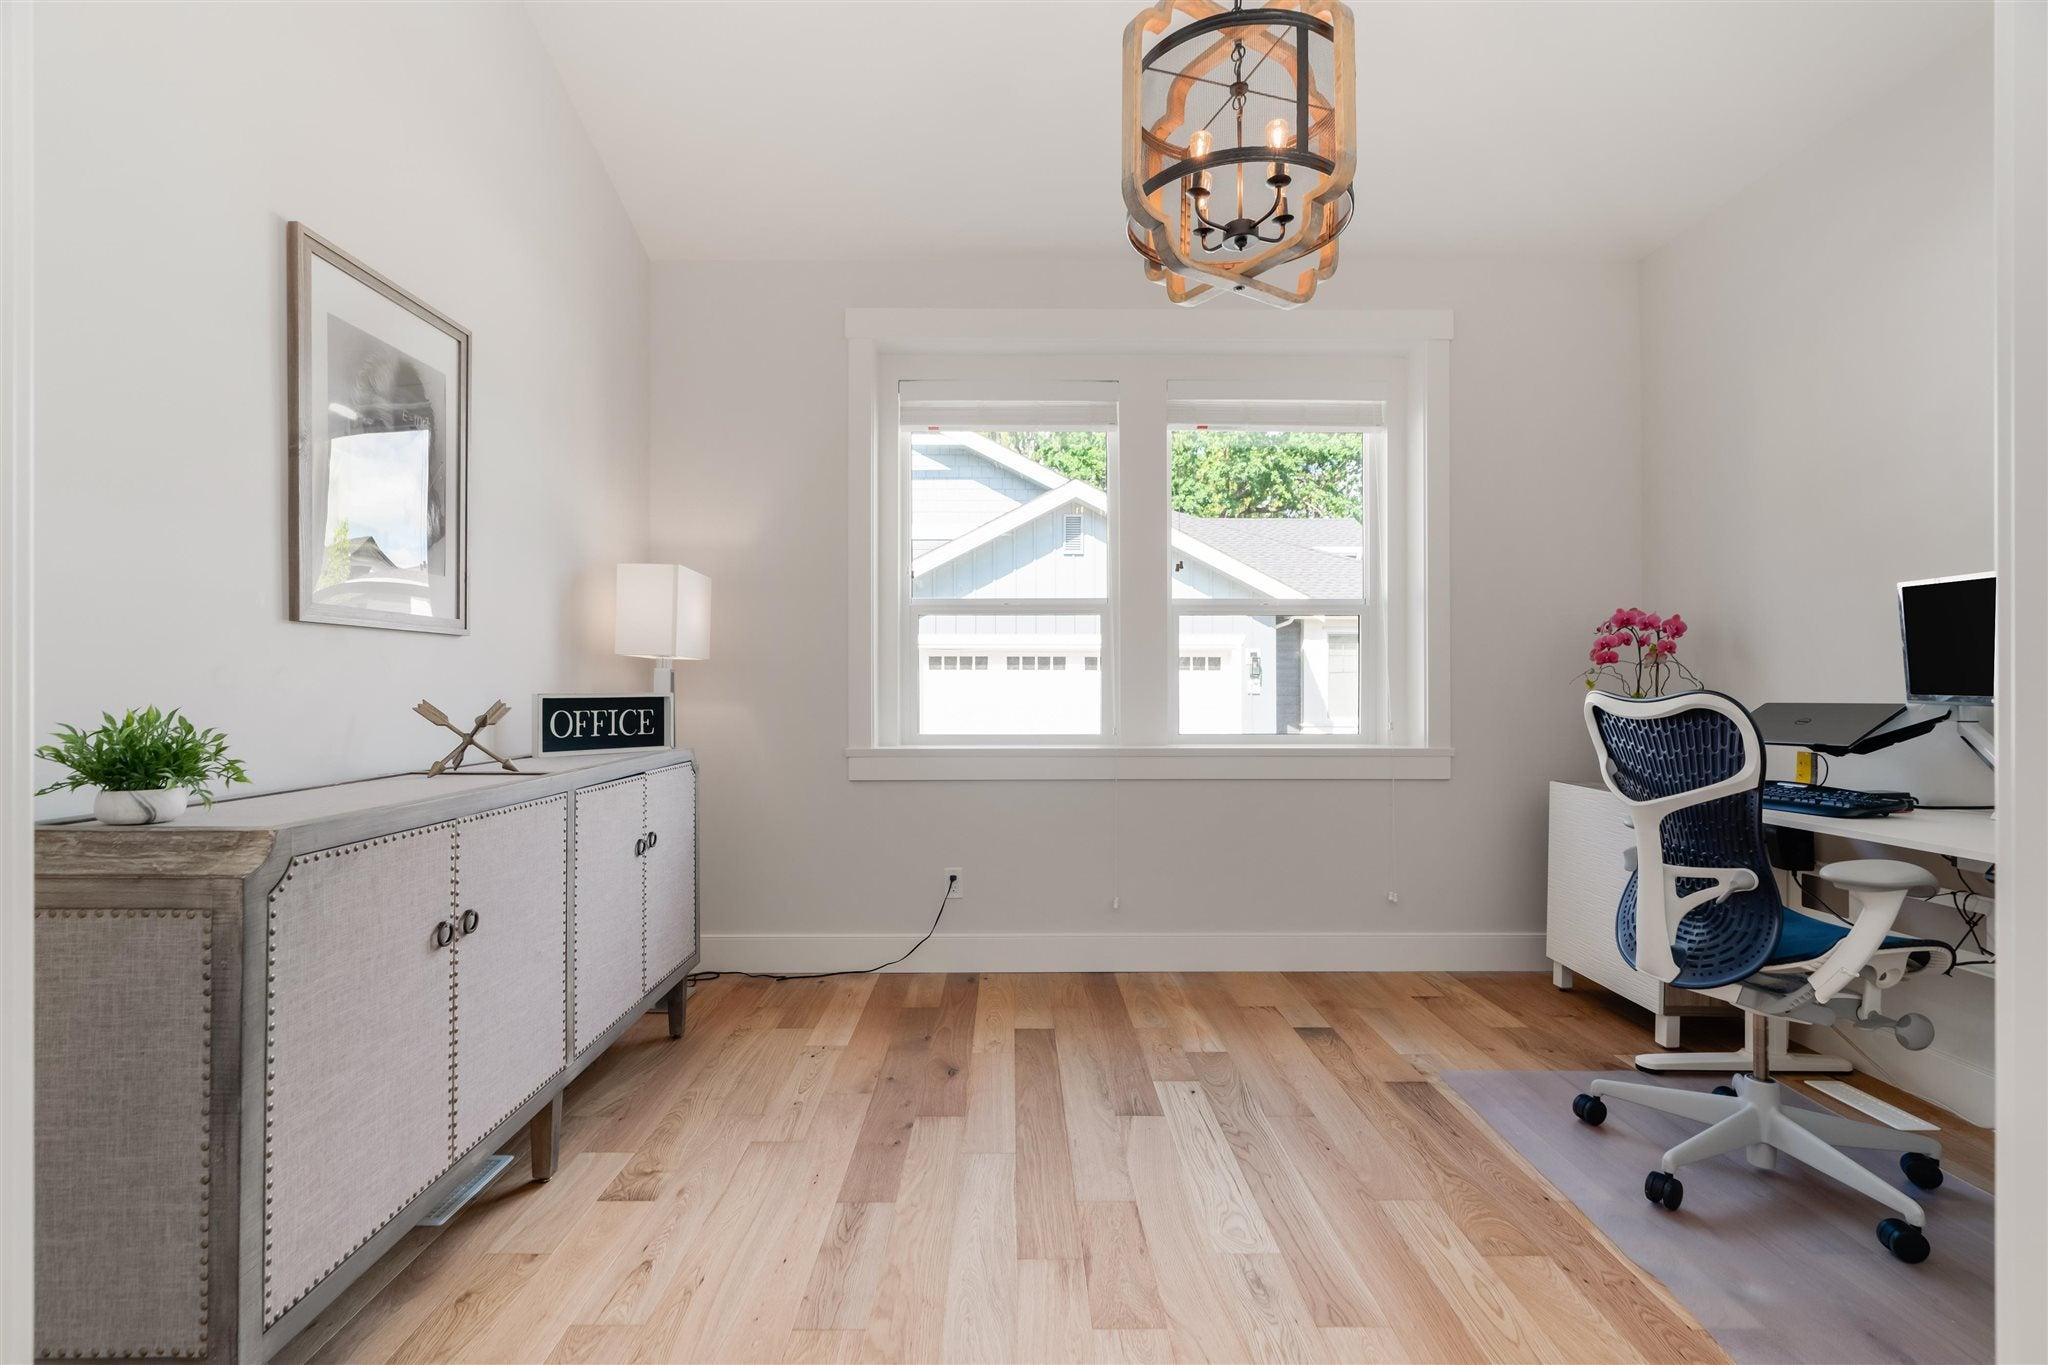 40 21858 47B AVENUE - Murrayville Townhouse for sale, 4 Bedrooms (R2603956) - #18